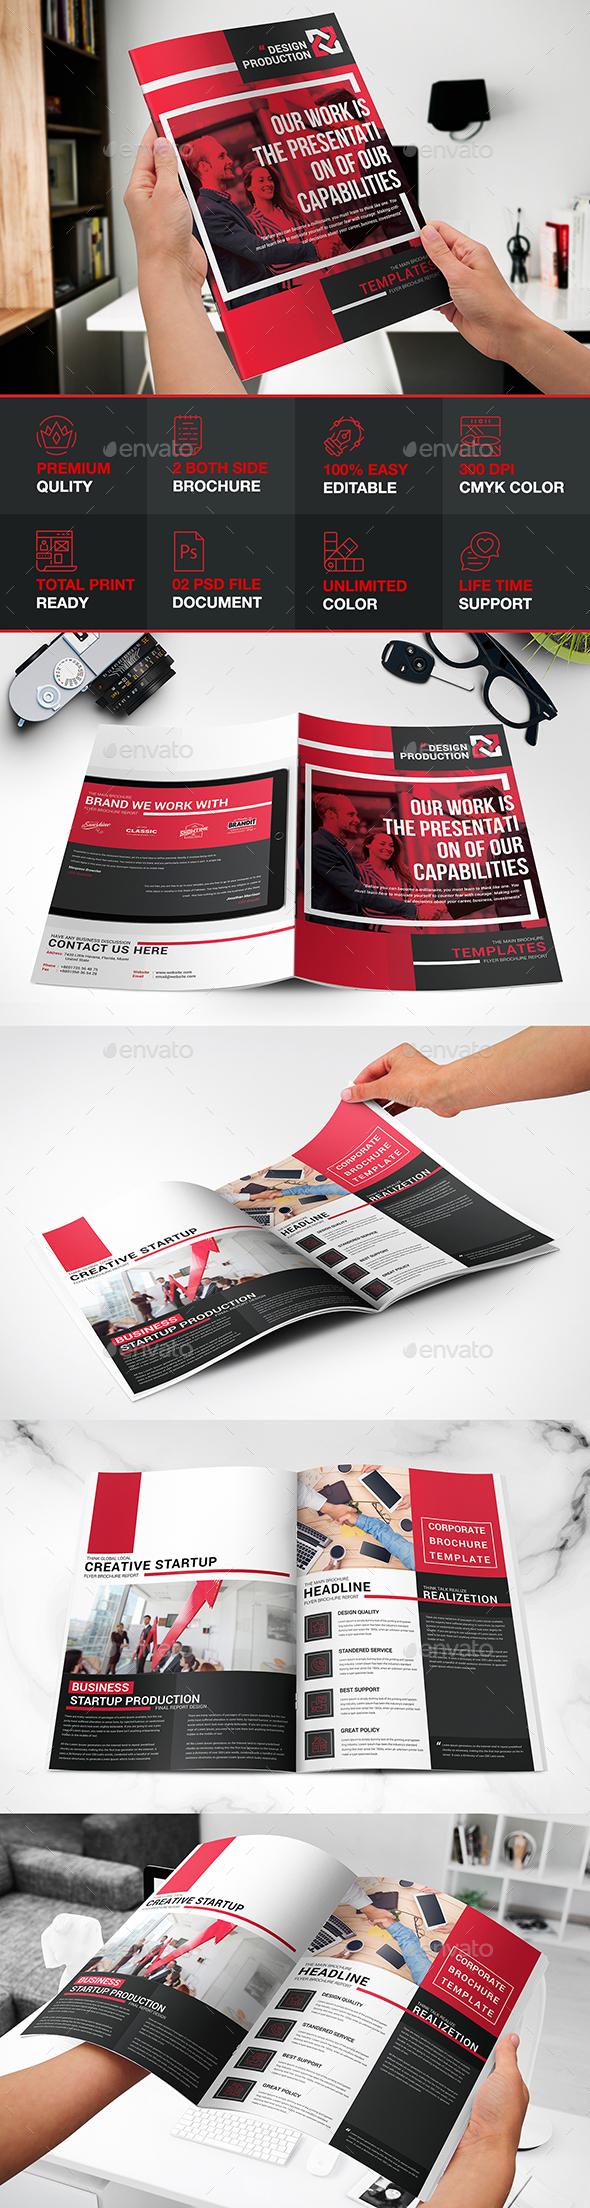 Redaram Bi-fold Brochure - Brochures Print Templates